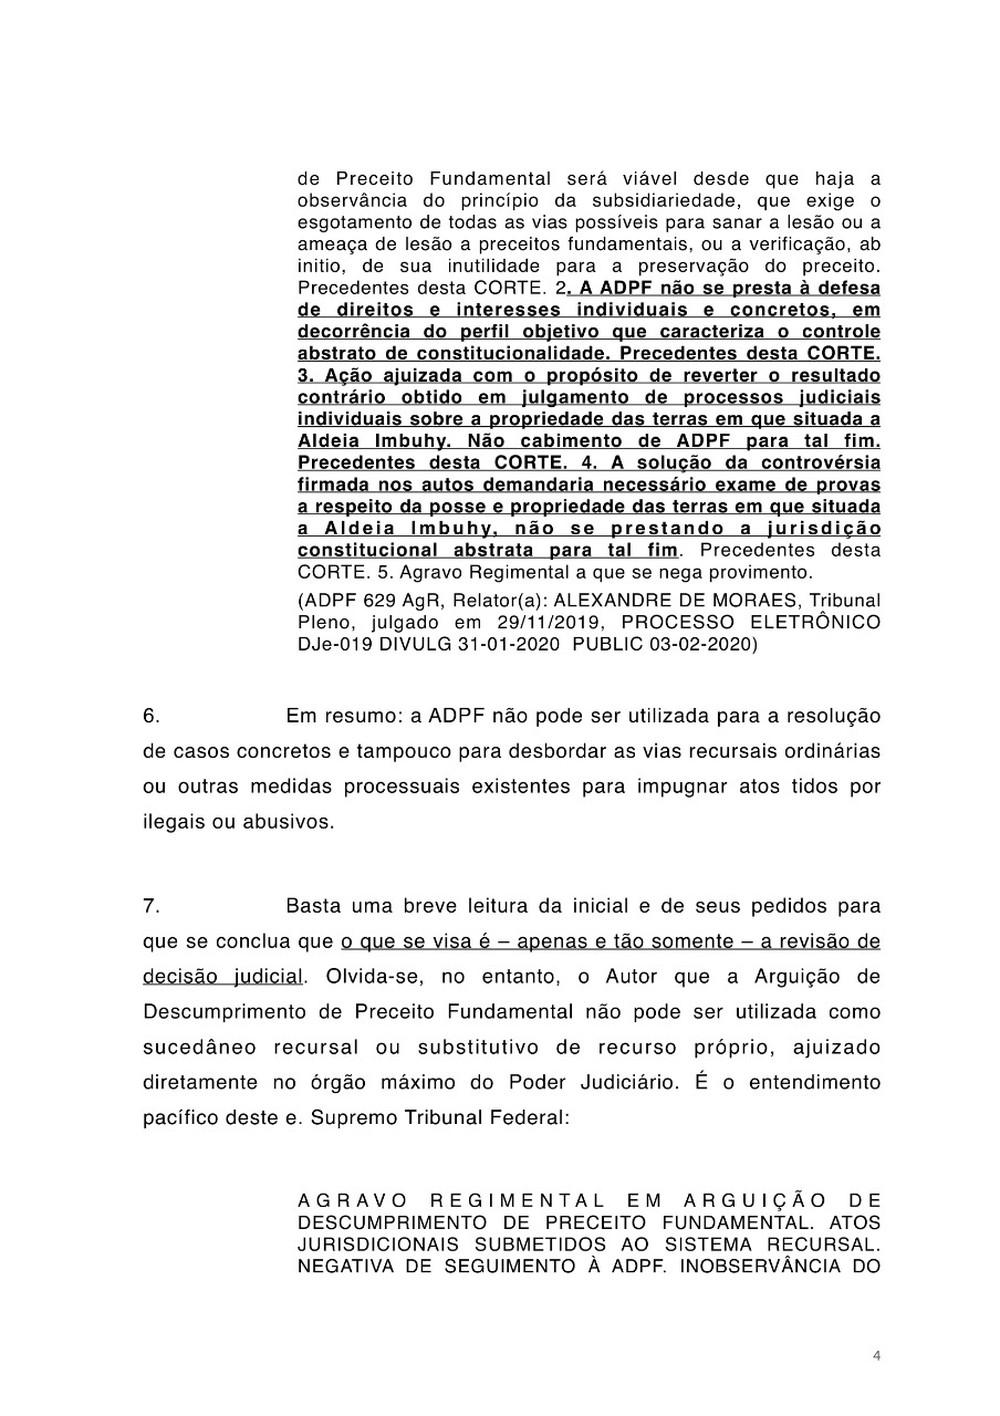 Petição Jorge Salgado STF Vasco página 4